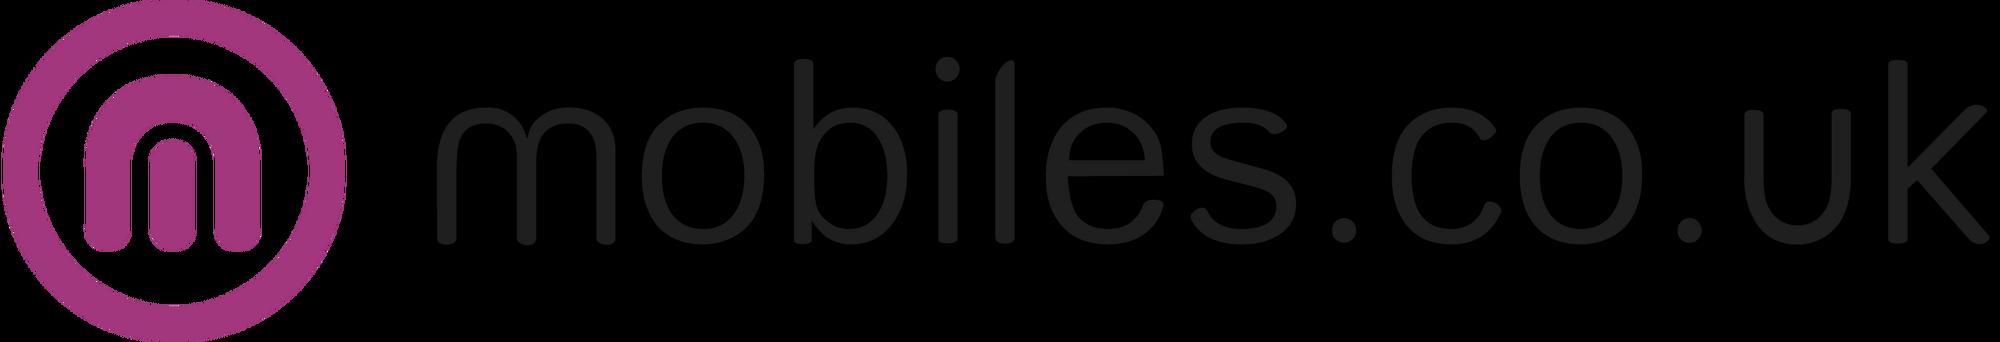 Mobiles co uk   Logopedia   FANDOM powered by Wikia